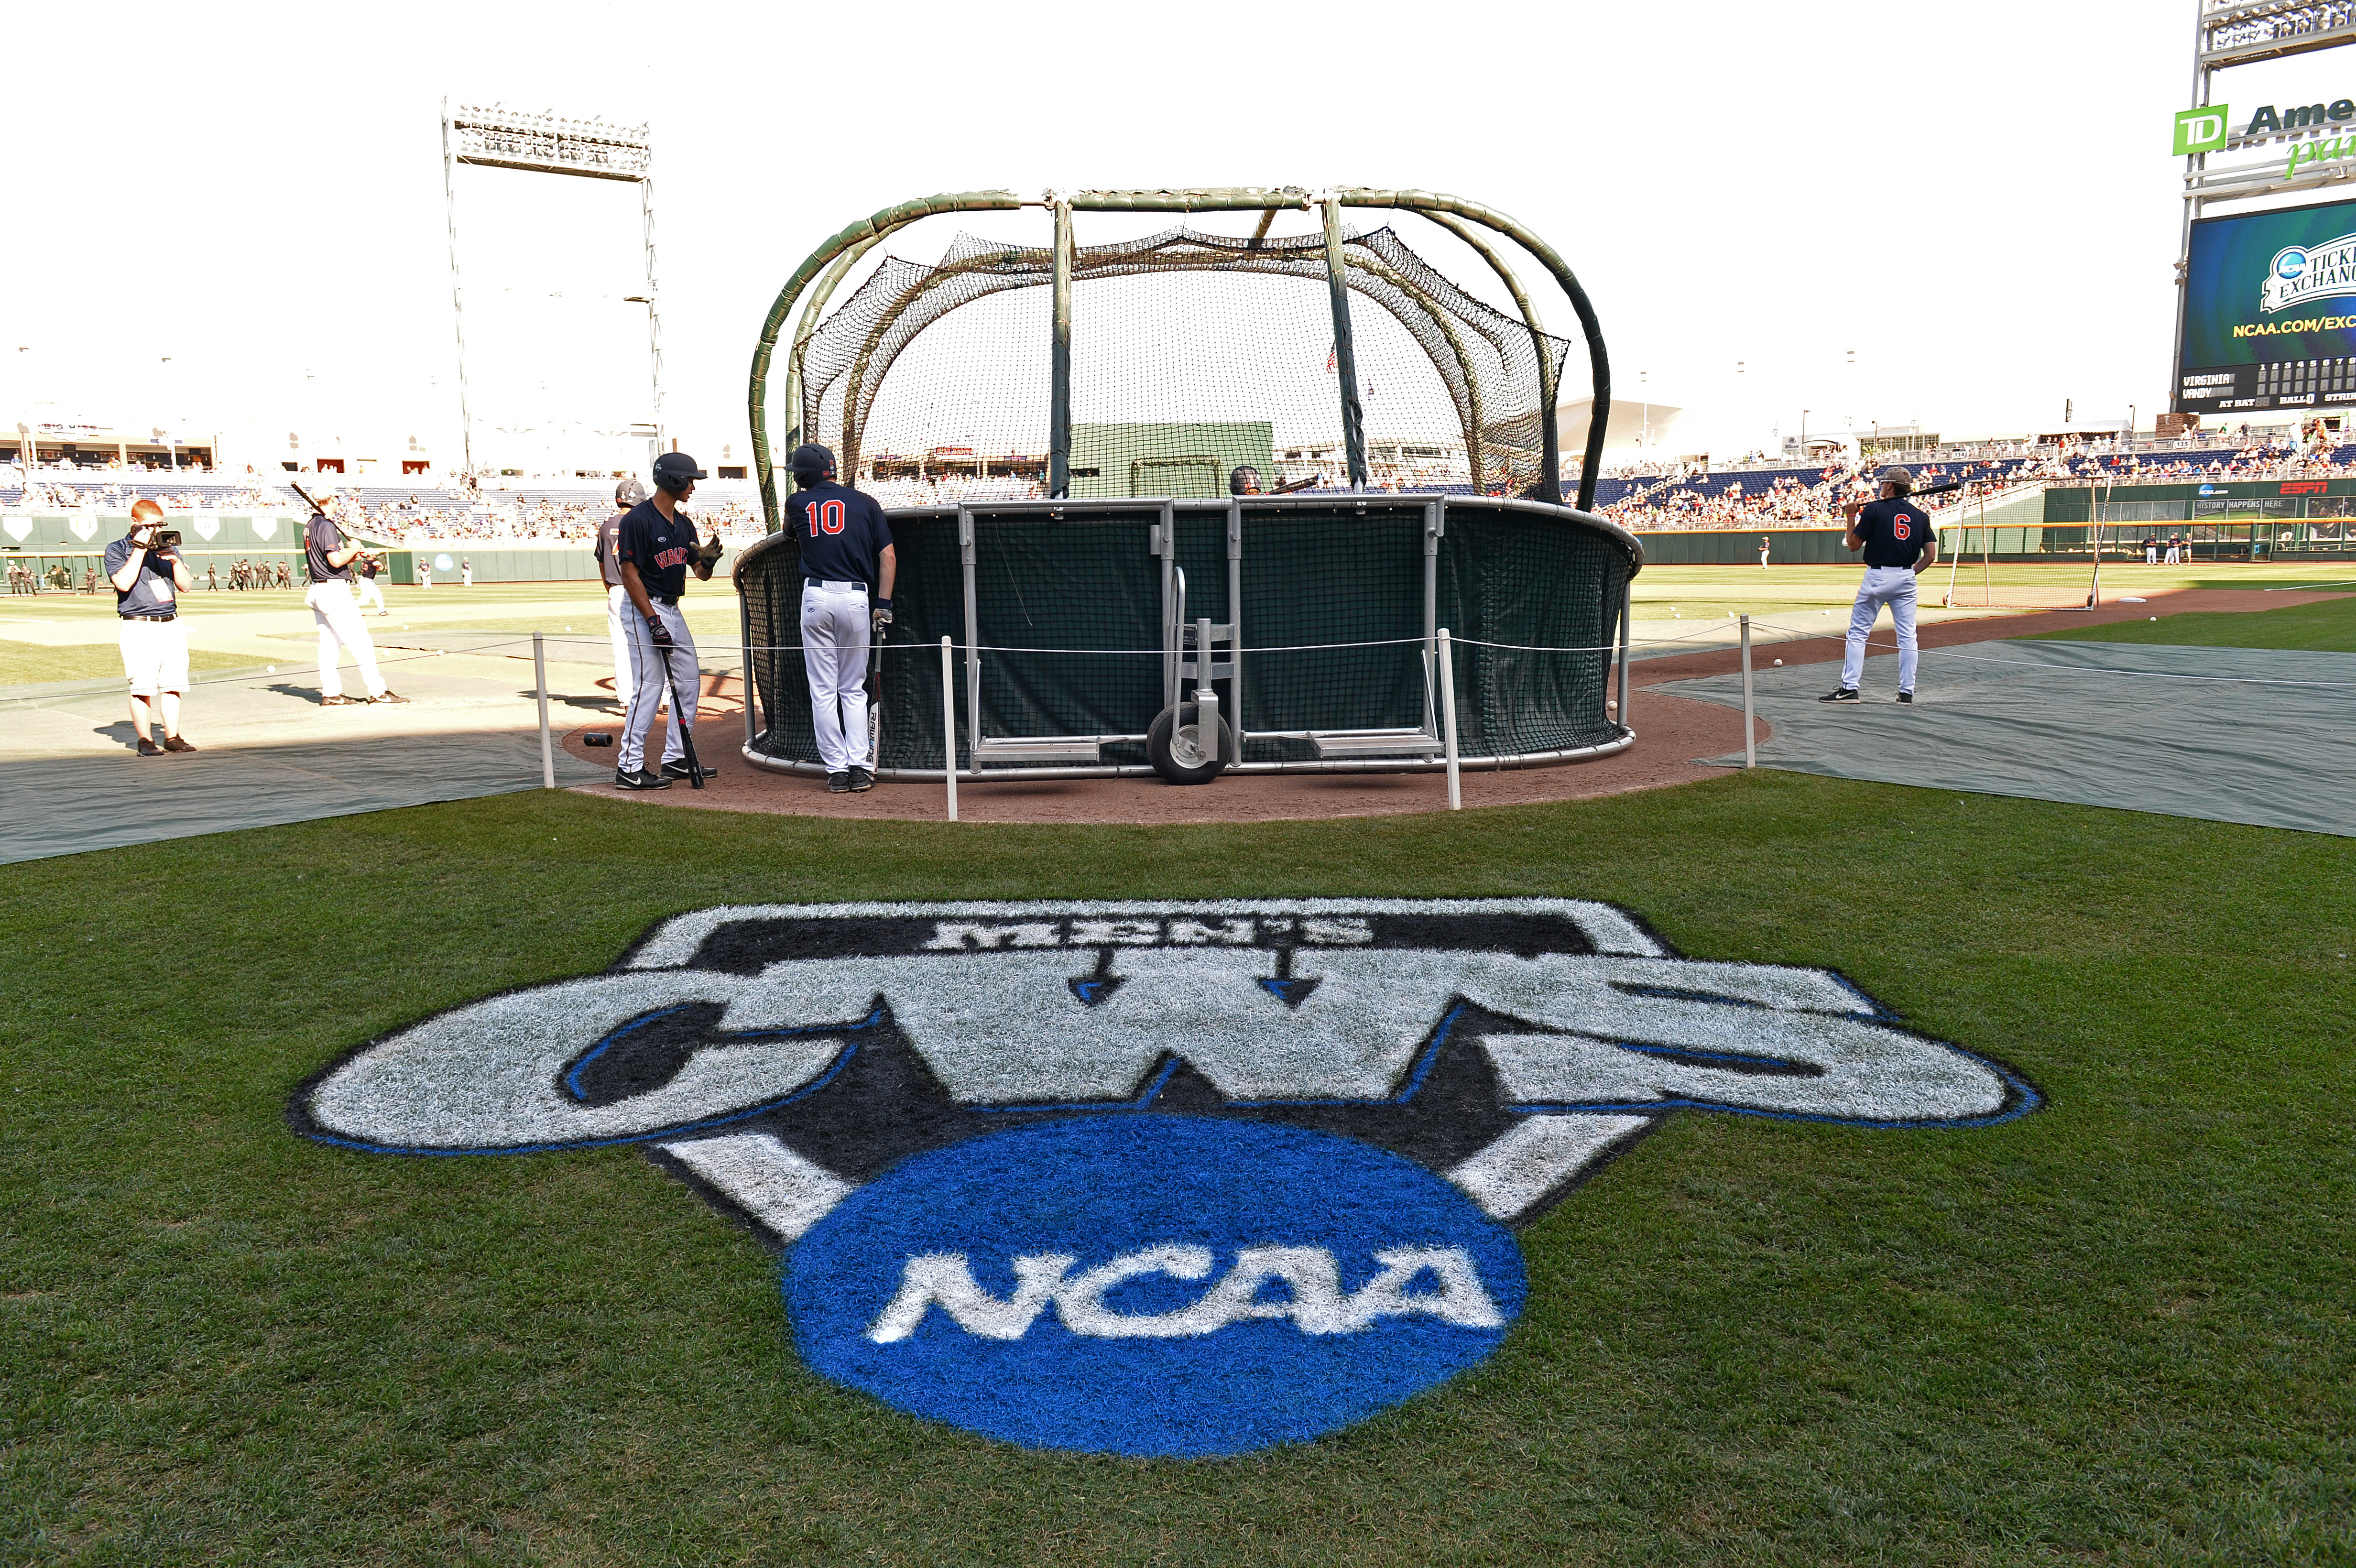 College World Series - Virginia v Vanderbilt - Game One